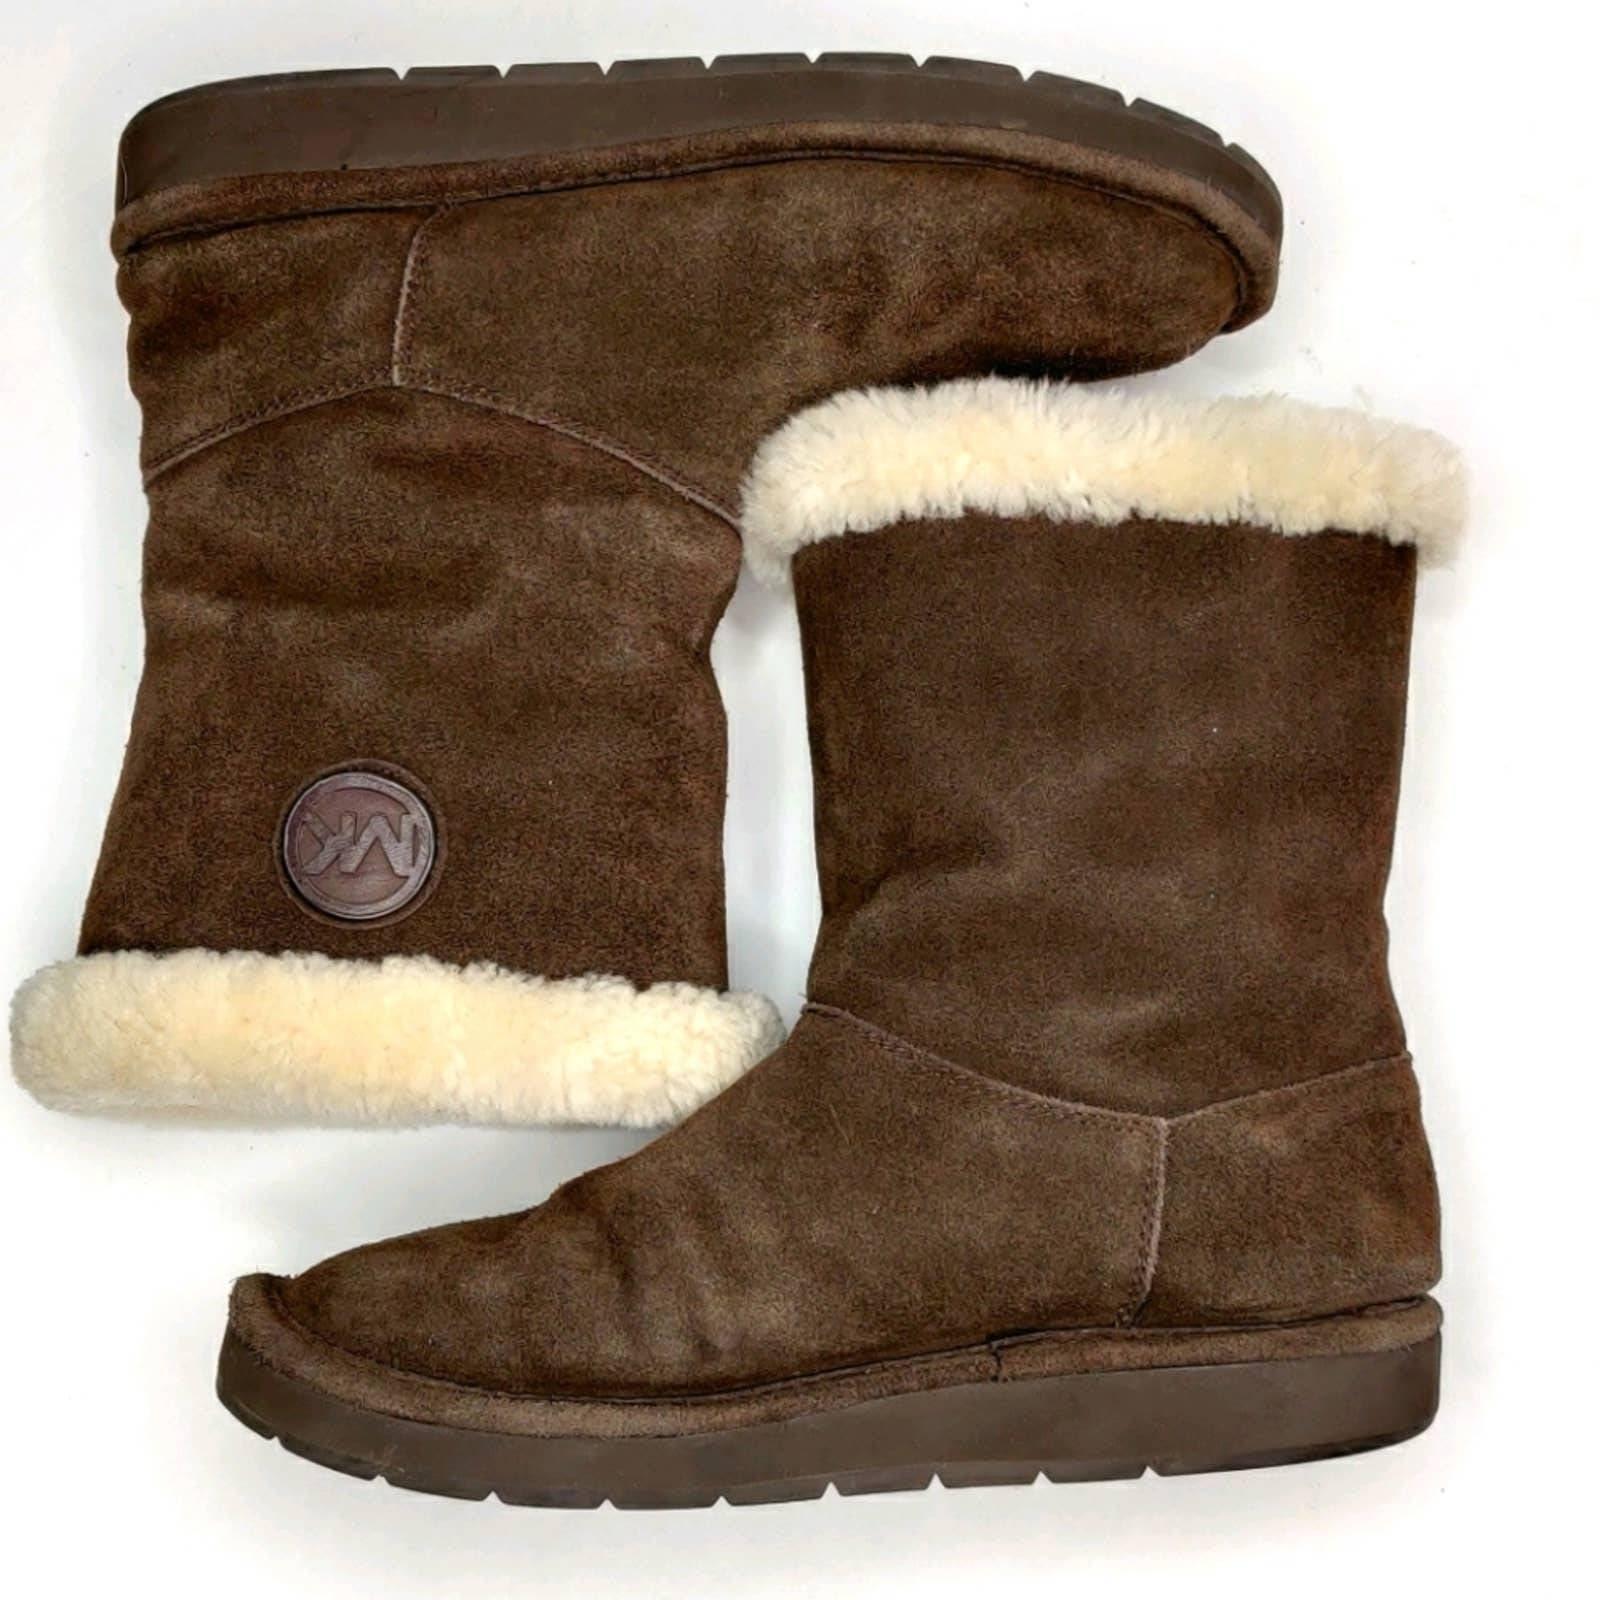 Michael Kors Chocolate Brown Boots